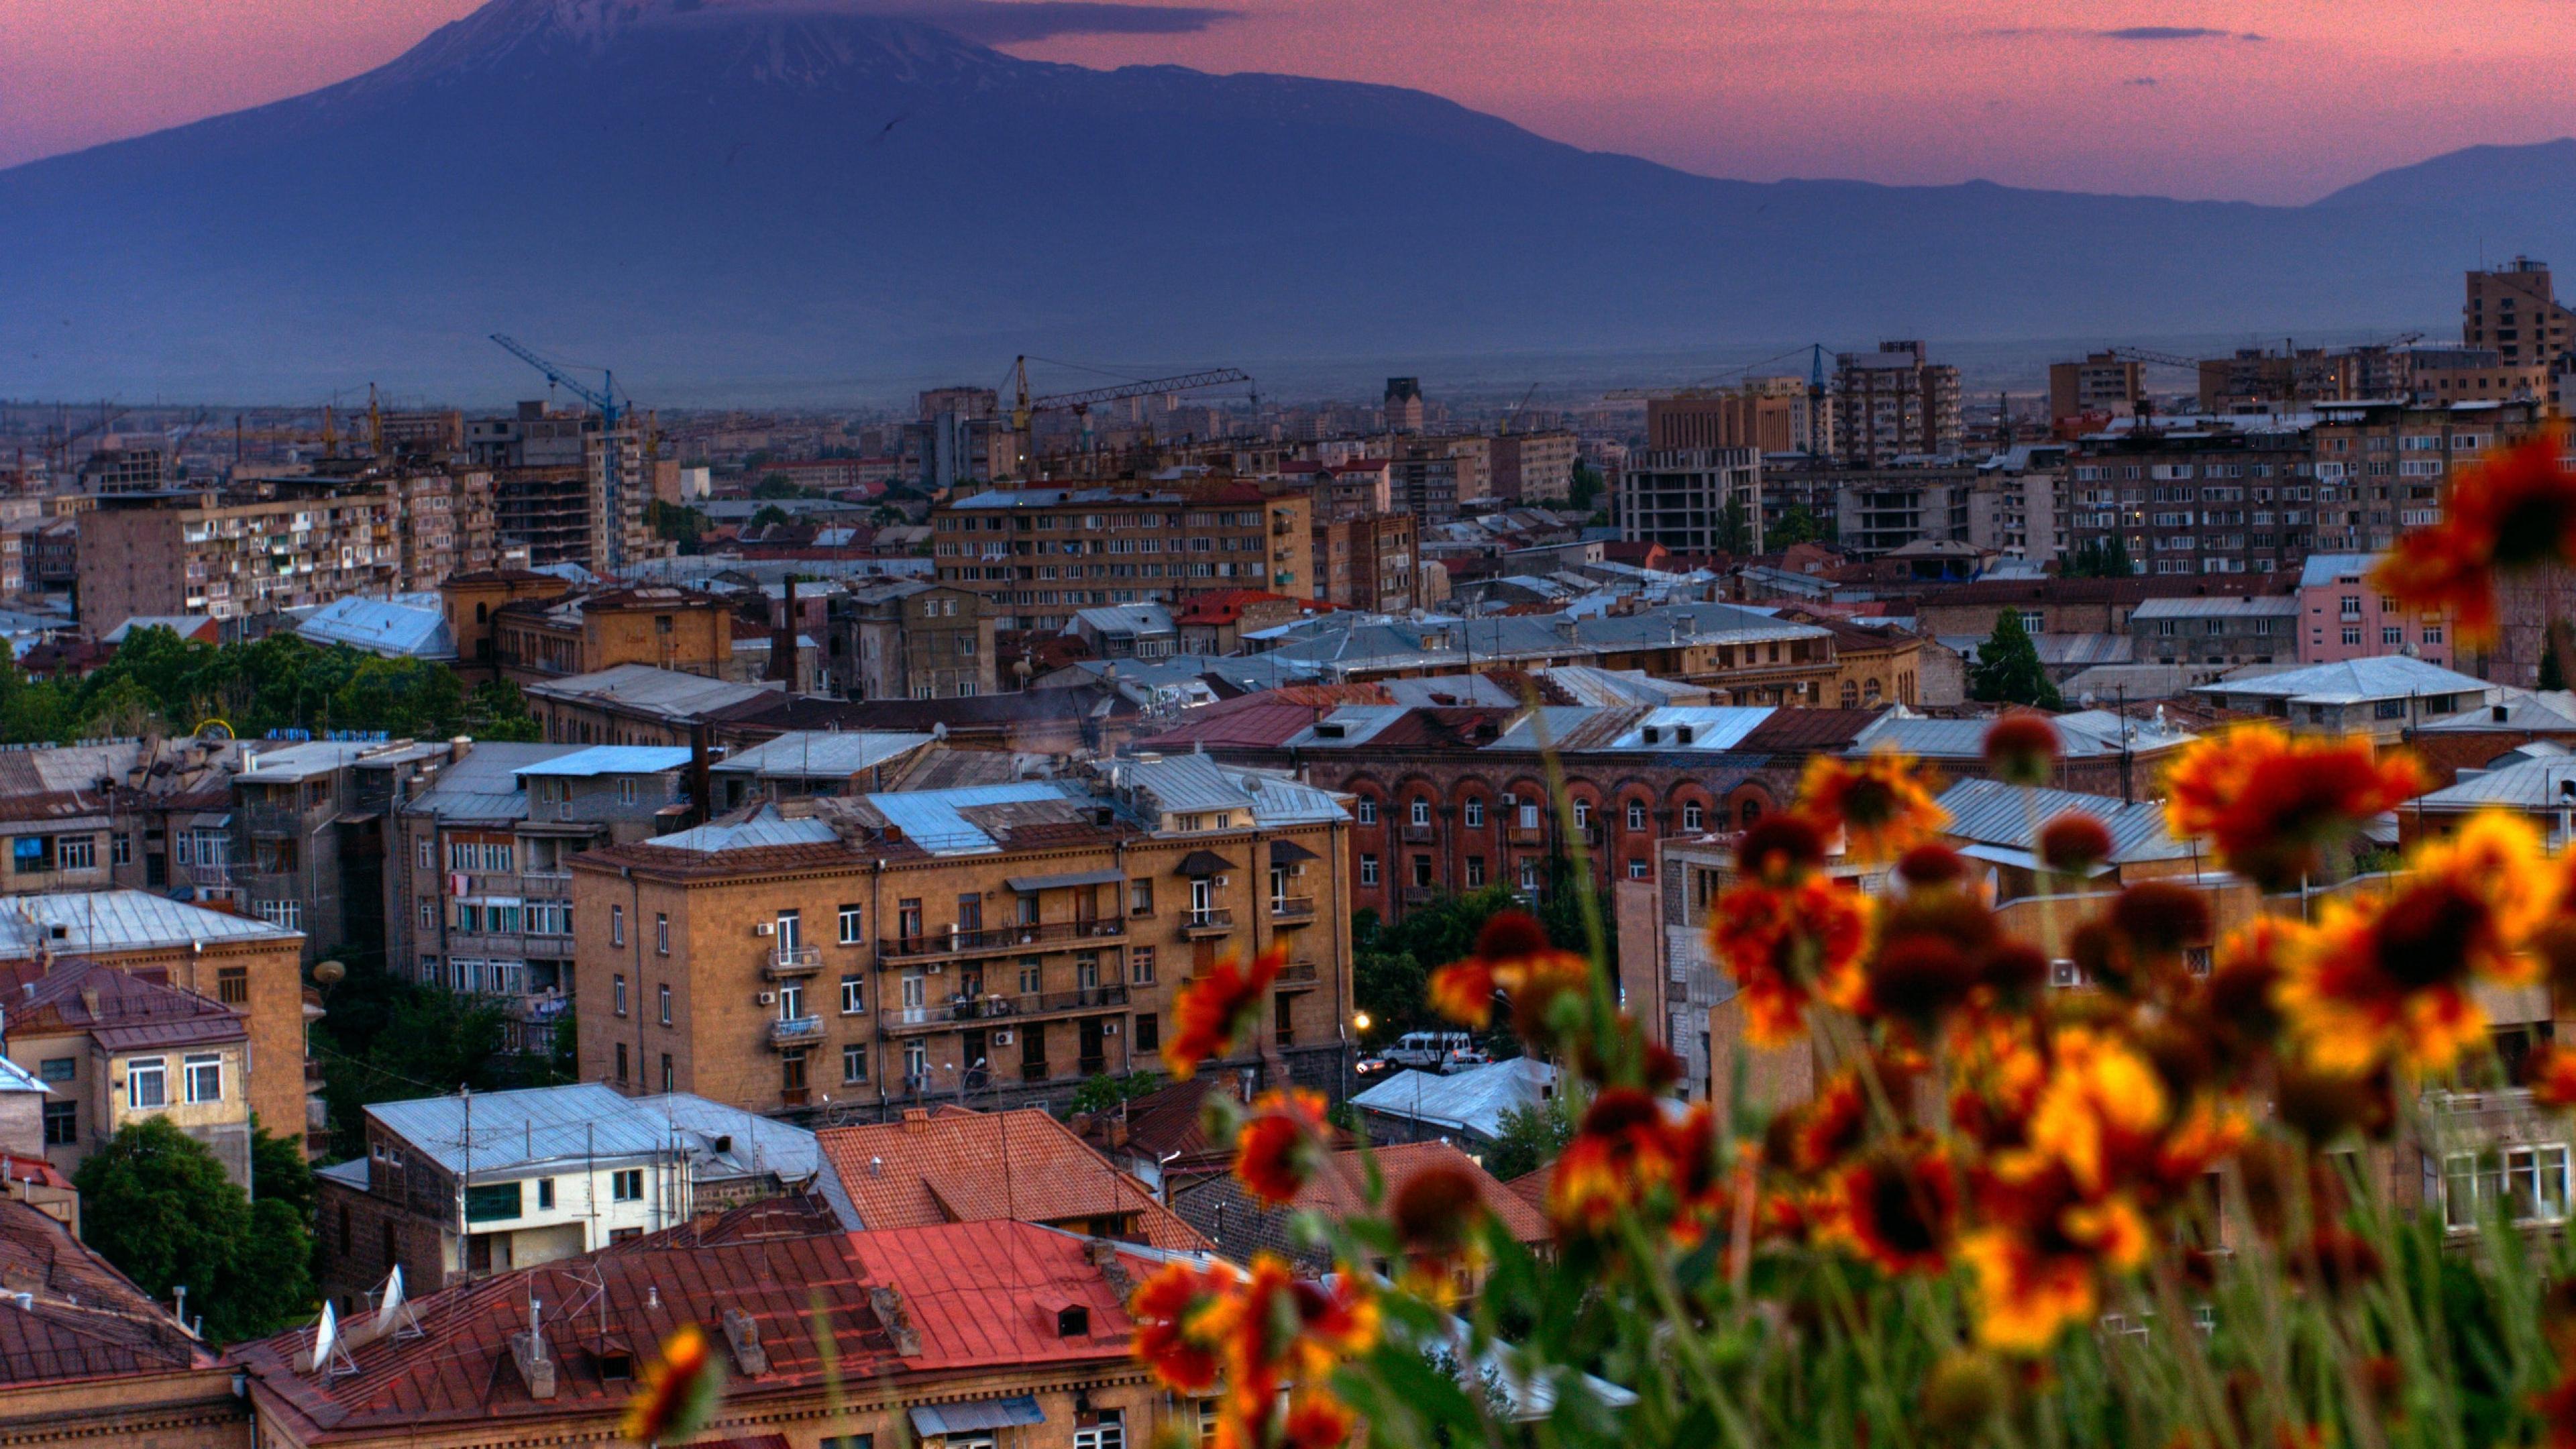 Hechos interesantes sobre Armenia